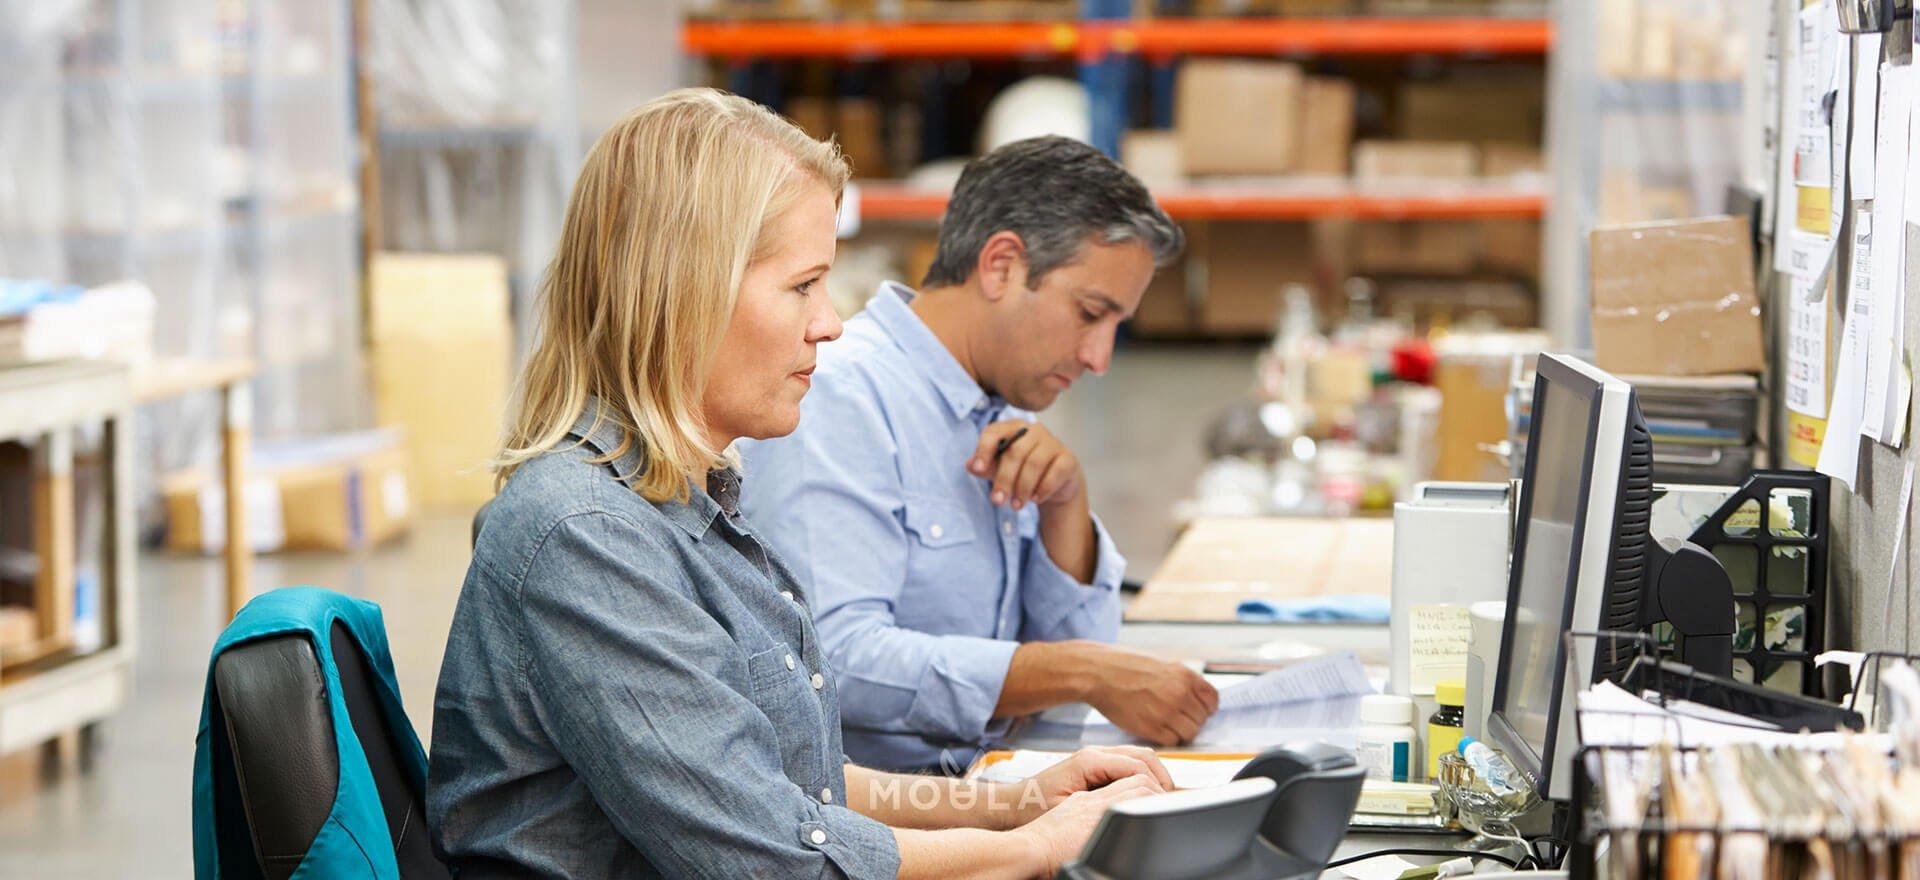 Three ways to simplify your business finances